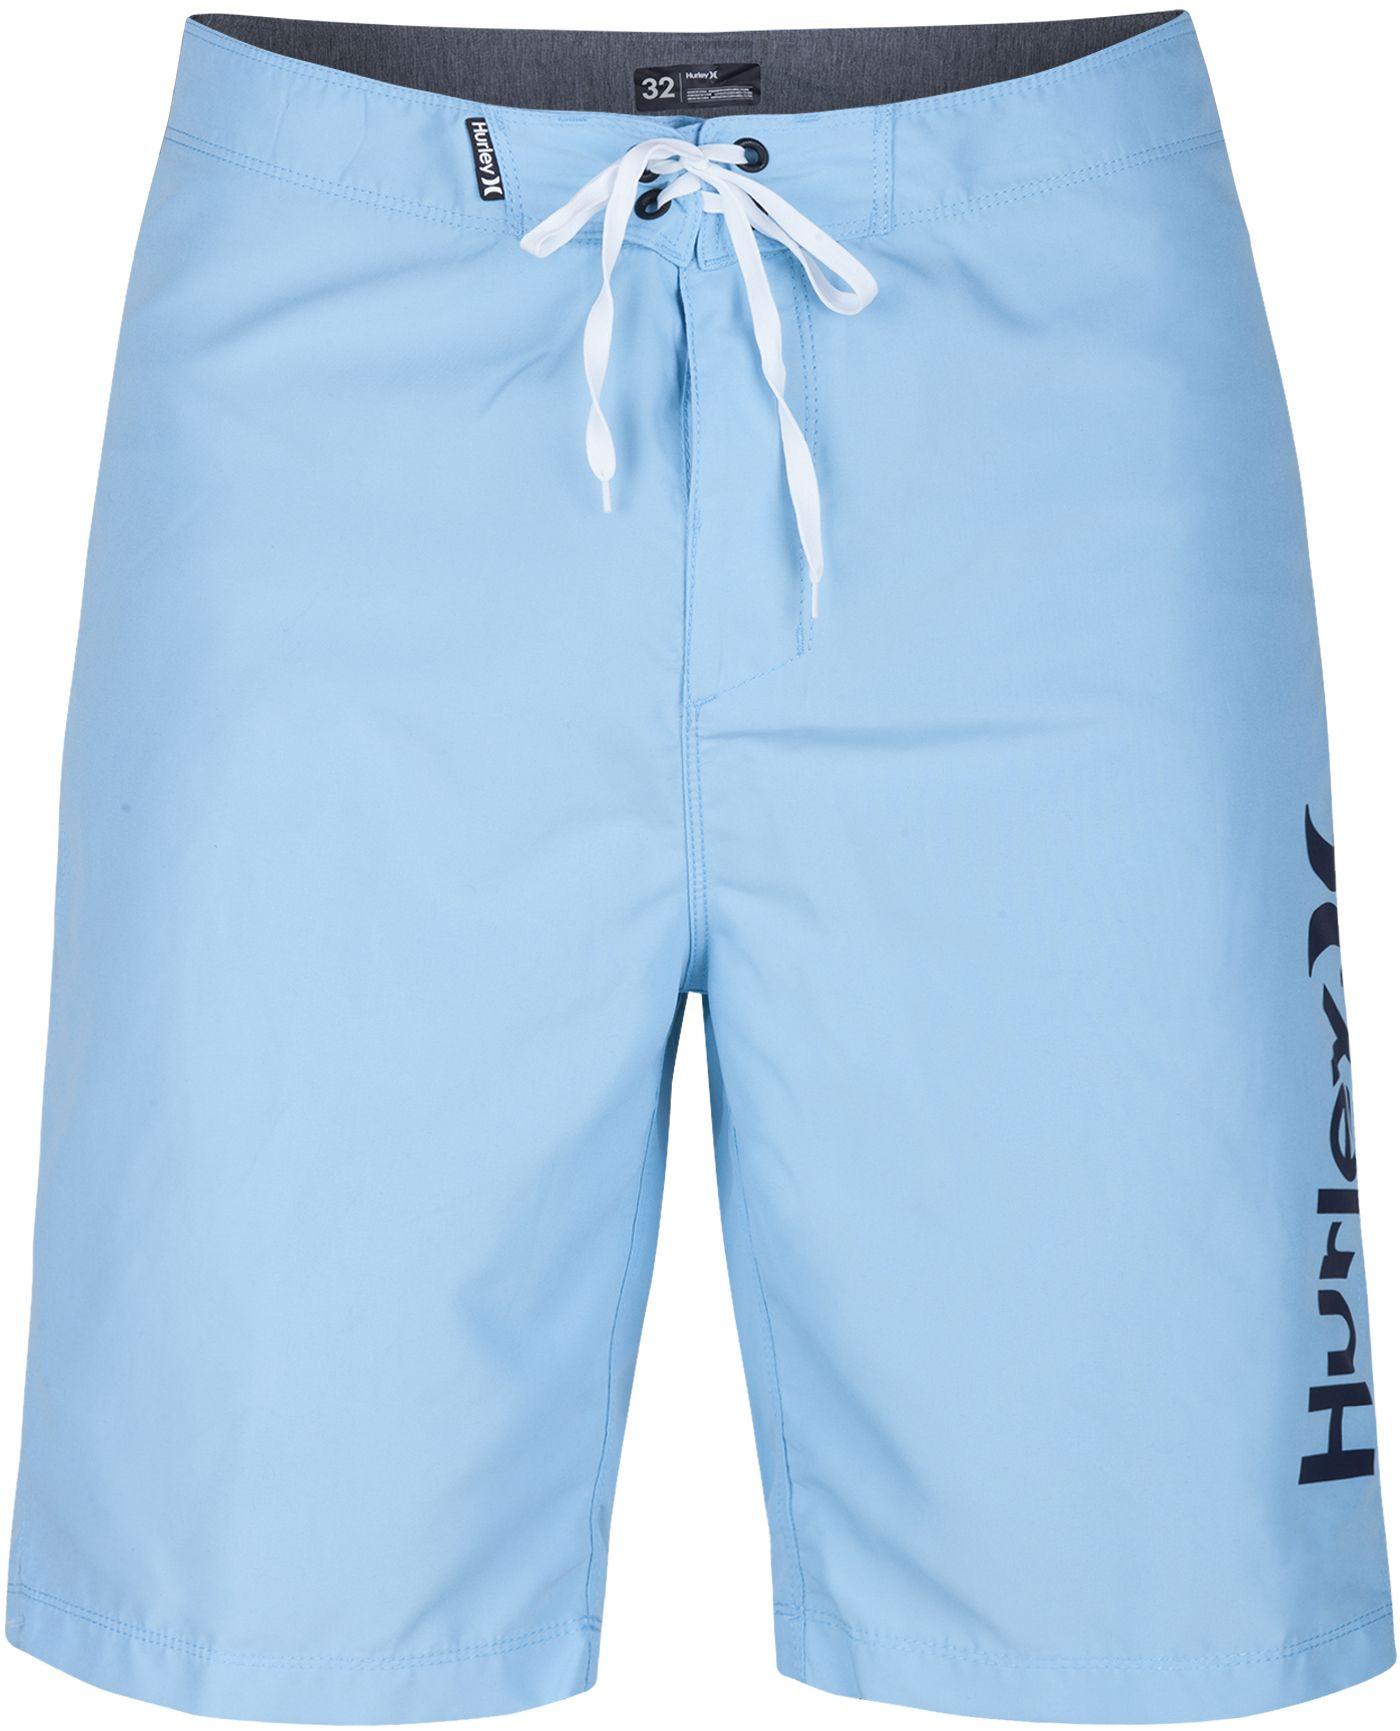 mens board shorts hurley menu0027s one u0026 only 2.0 board shorts BLOSAVM